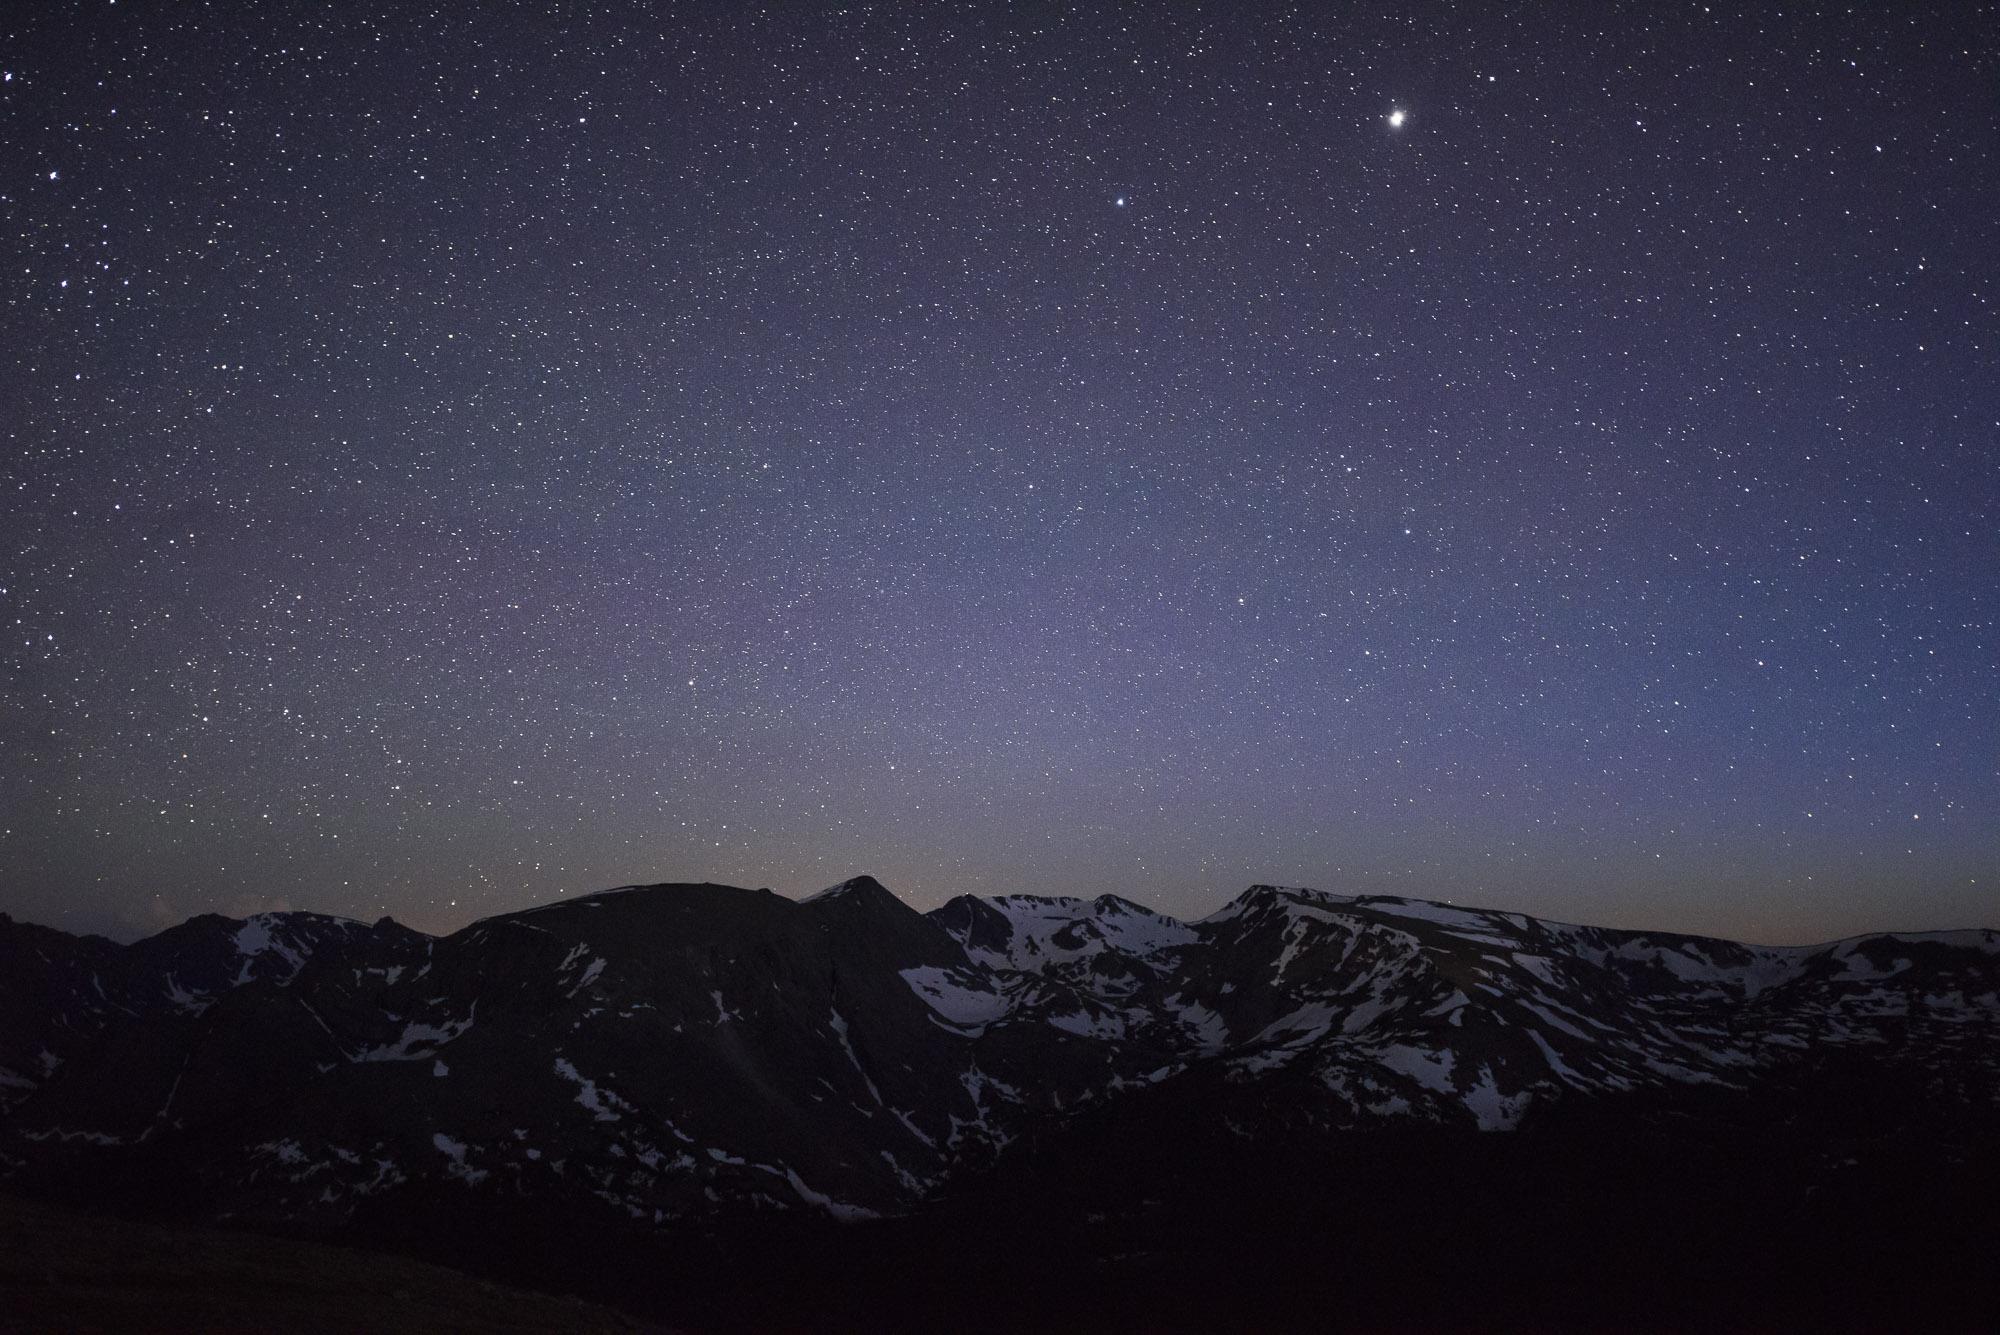 Rocky Mountain_Nicholson__CS72643-E.jpg